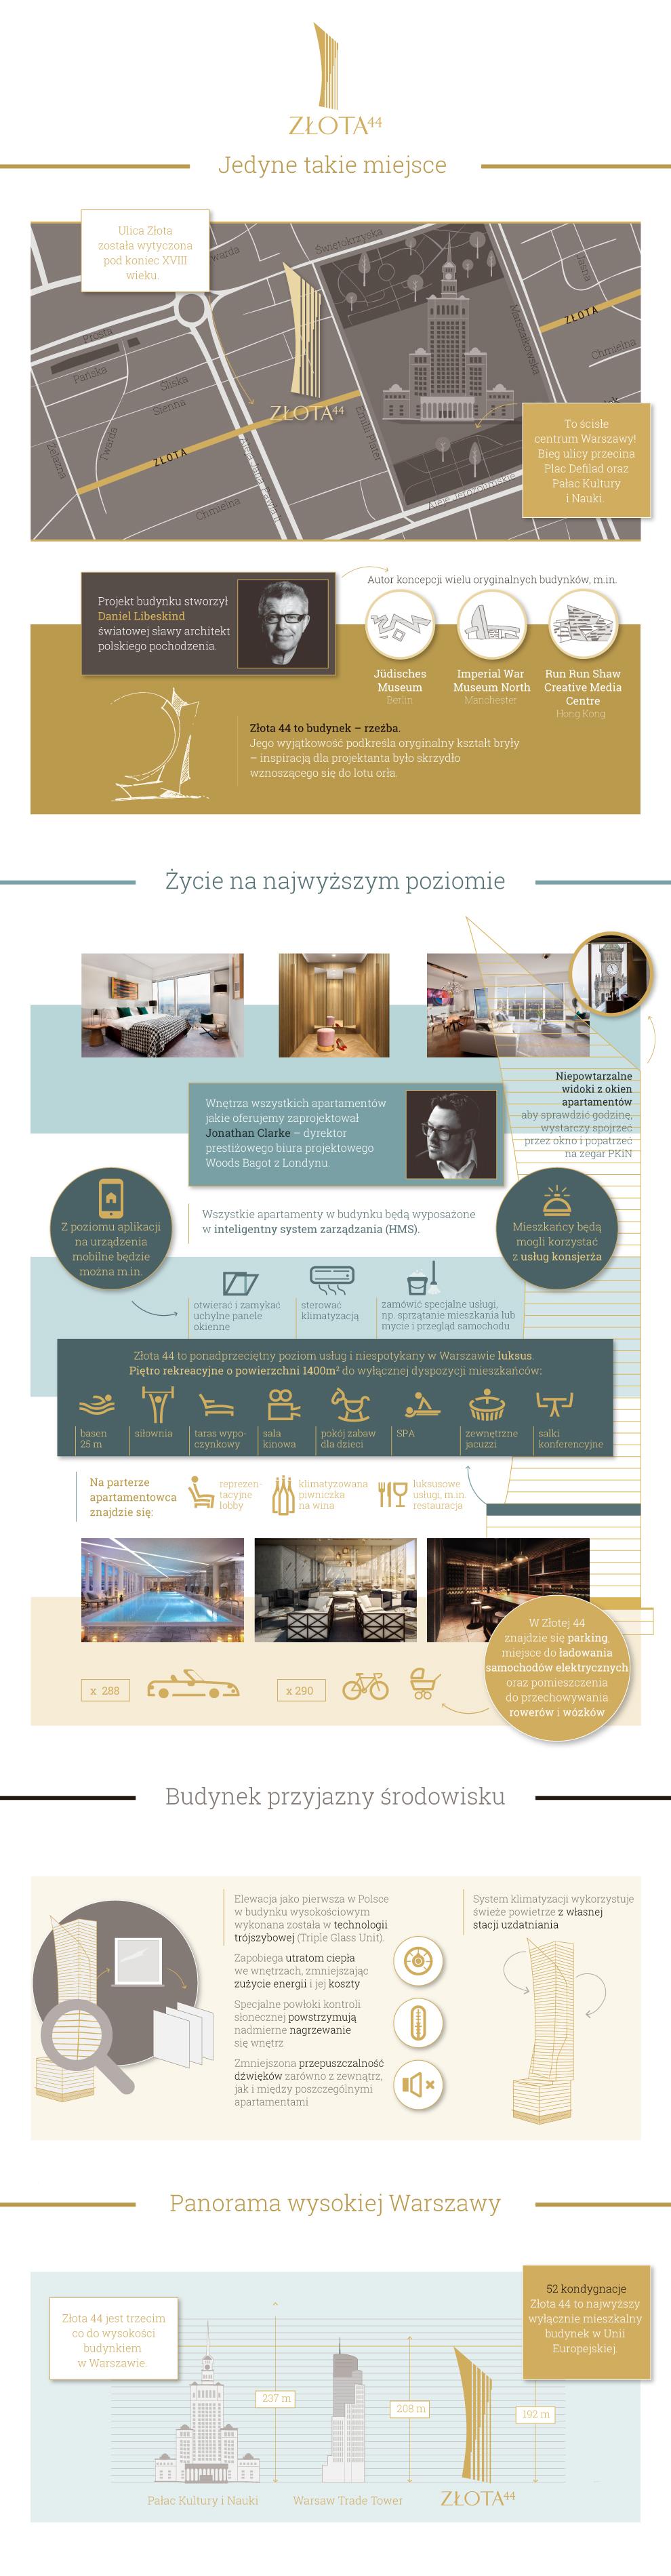 infografika-zlota44